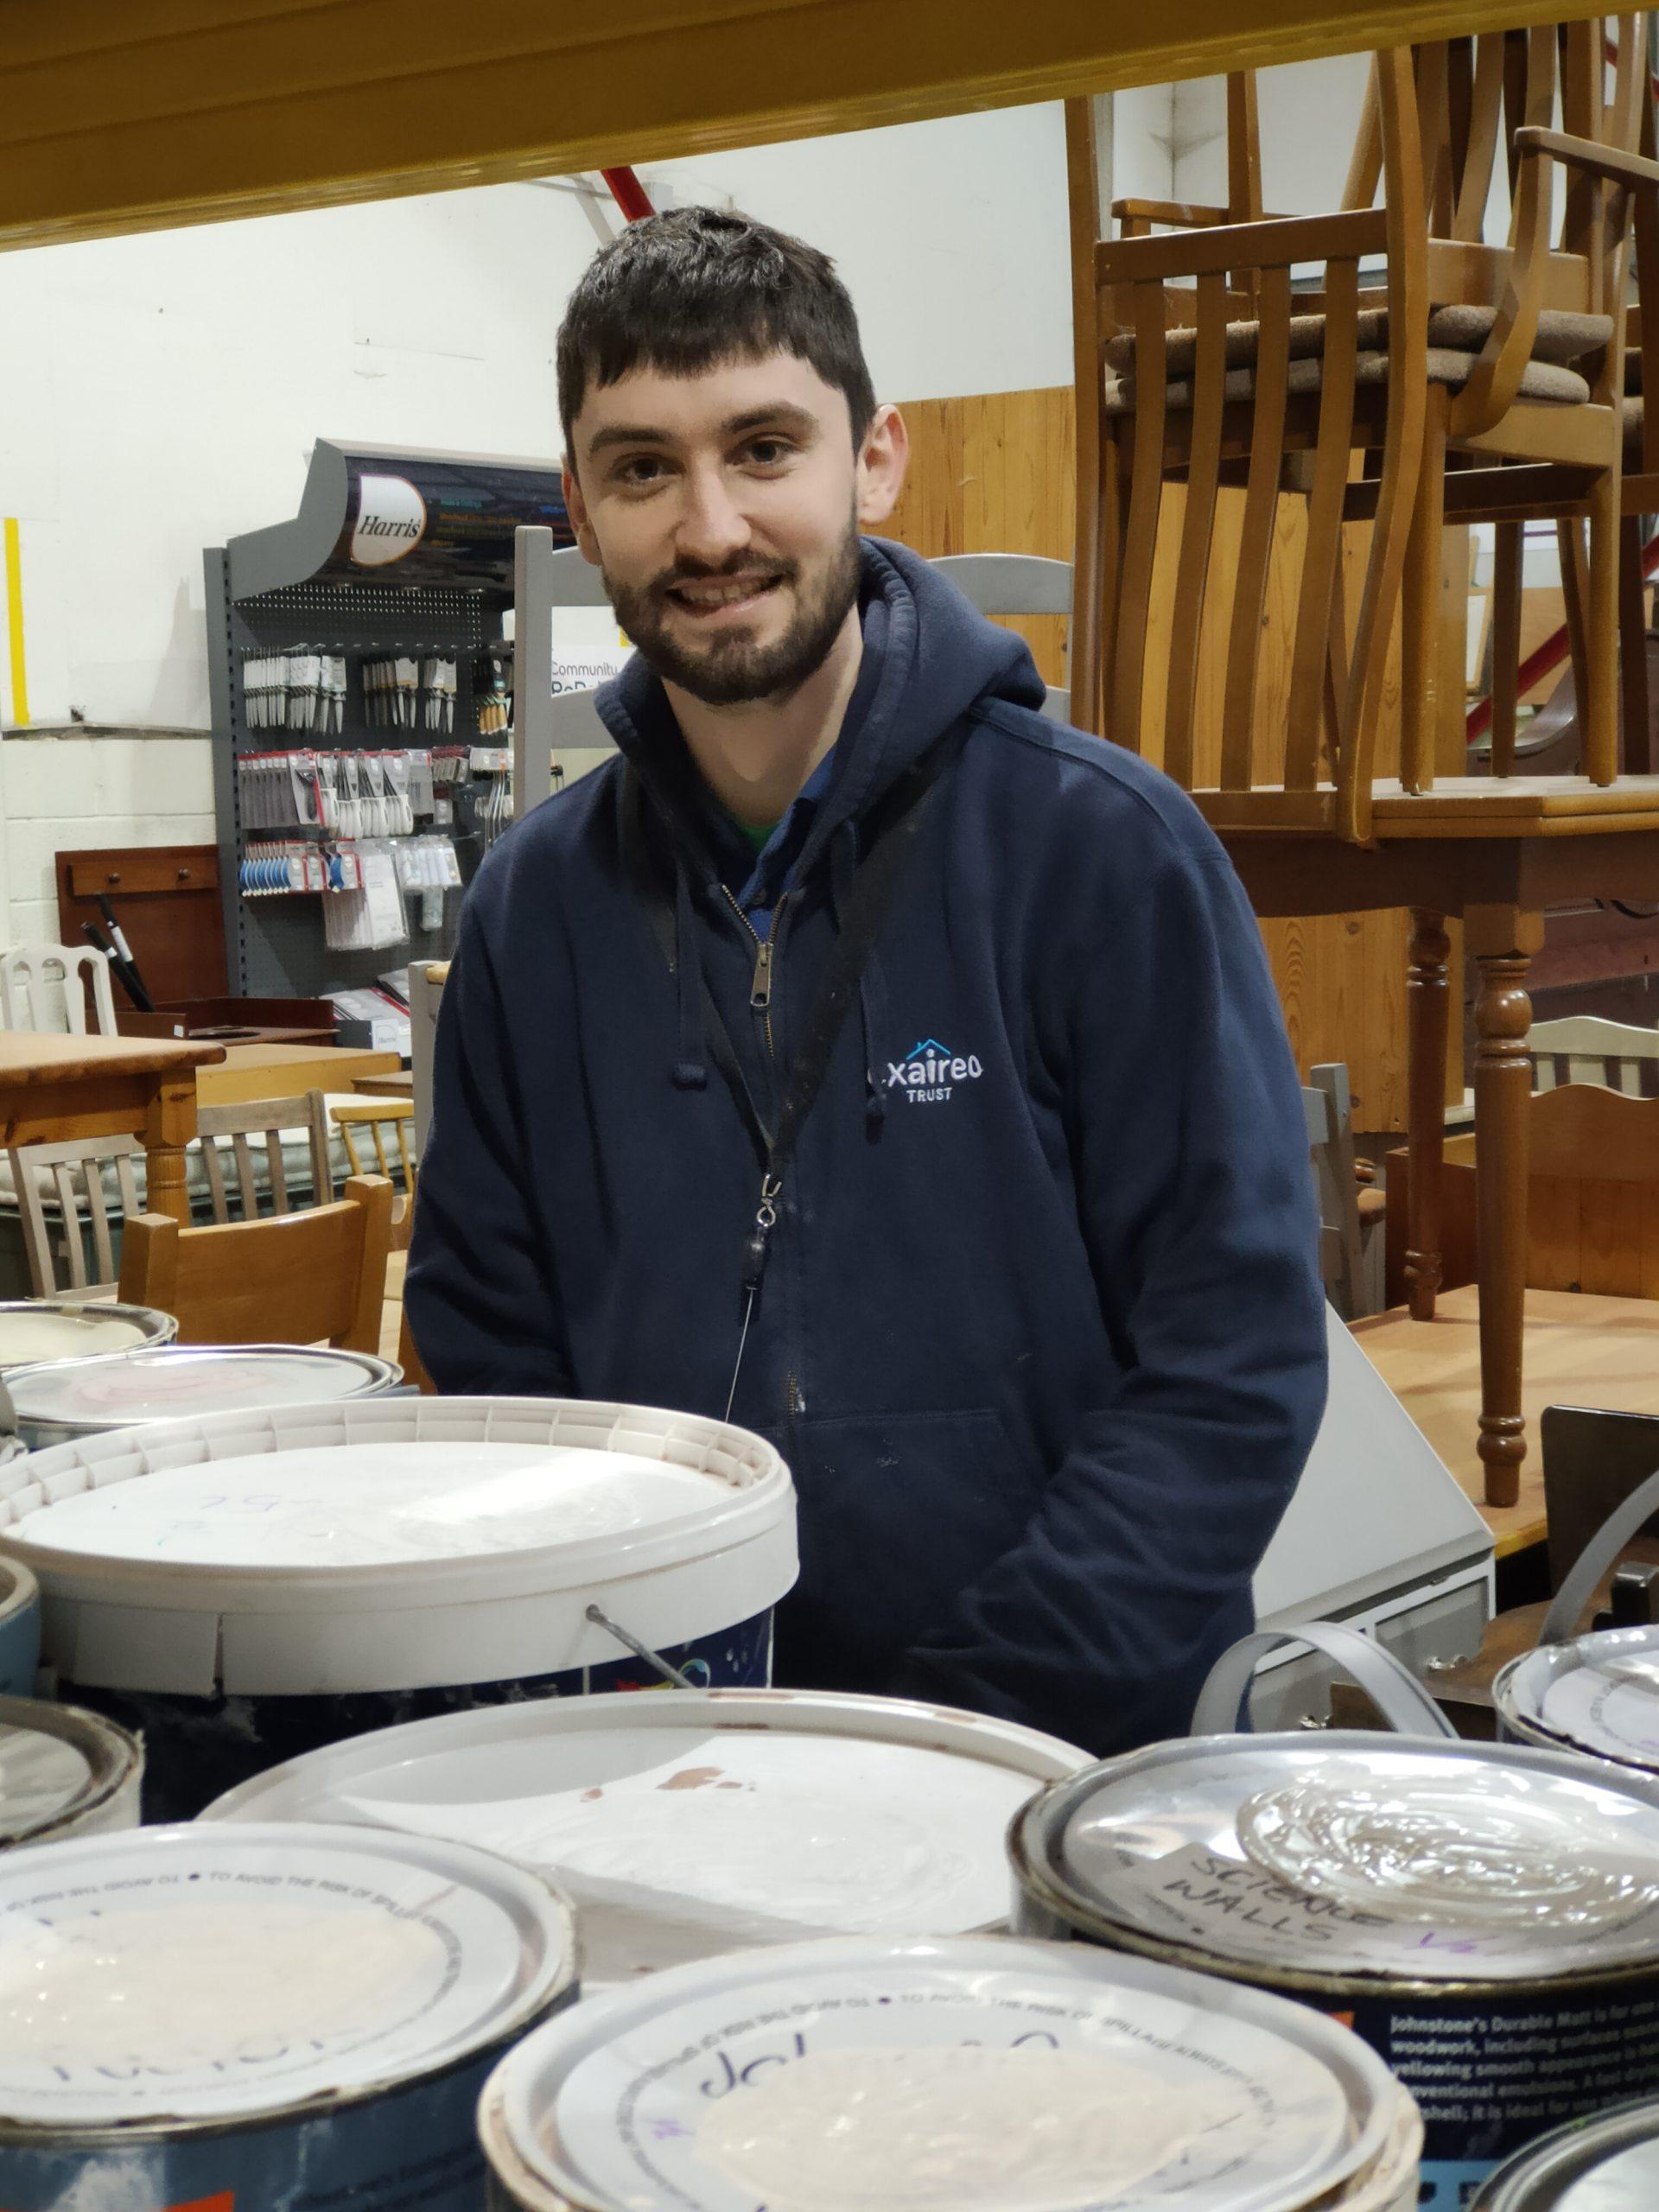 Matt Wood Shop Manager at Community RePaint Loughborough